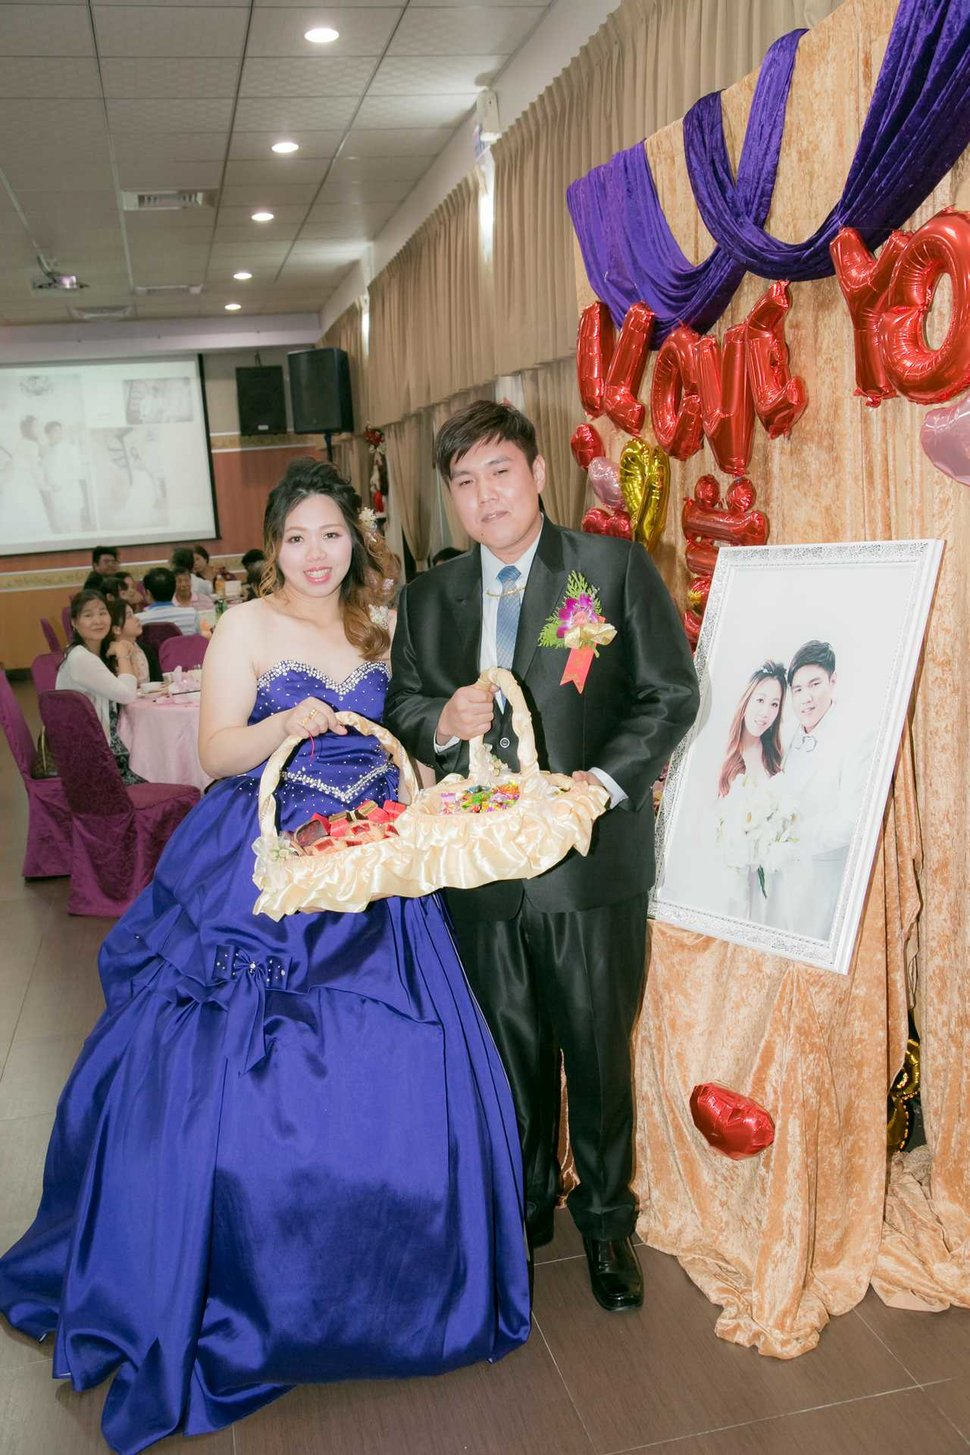 Wedding_Photo_2016_027 - 婚禮攝影師皓溫-婚攝Hoan《結婚吧》